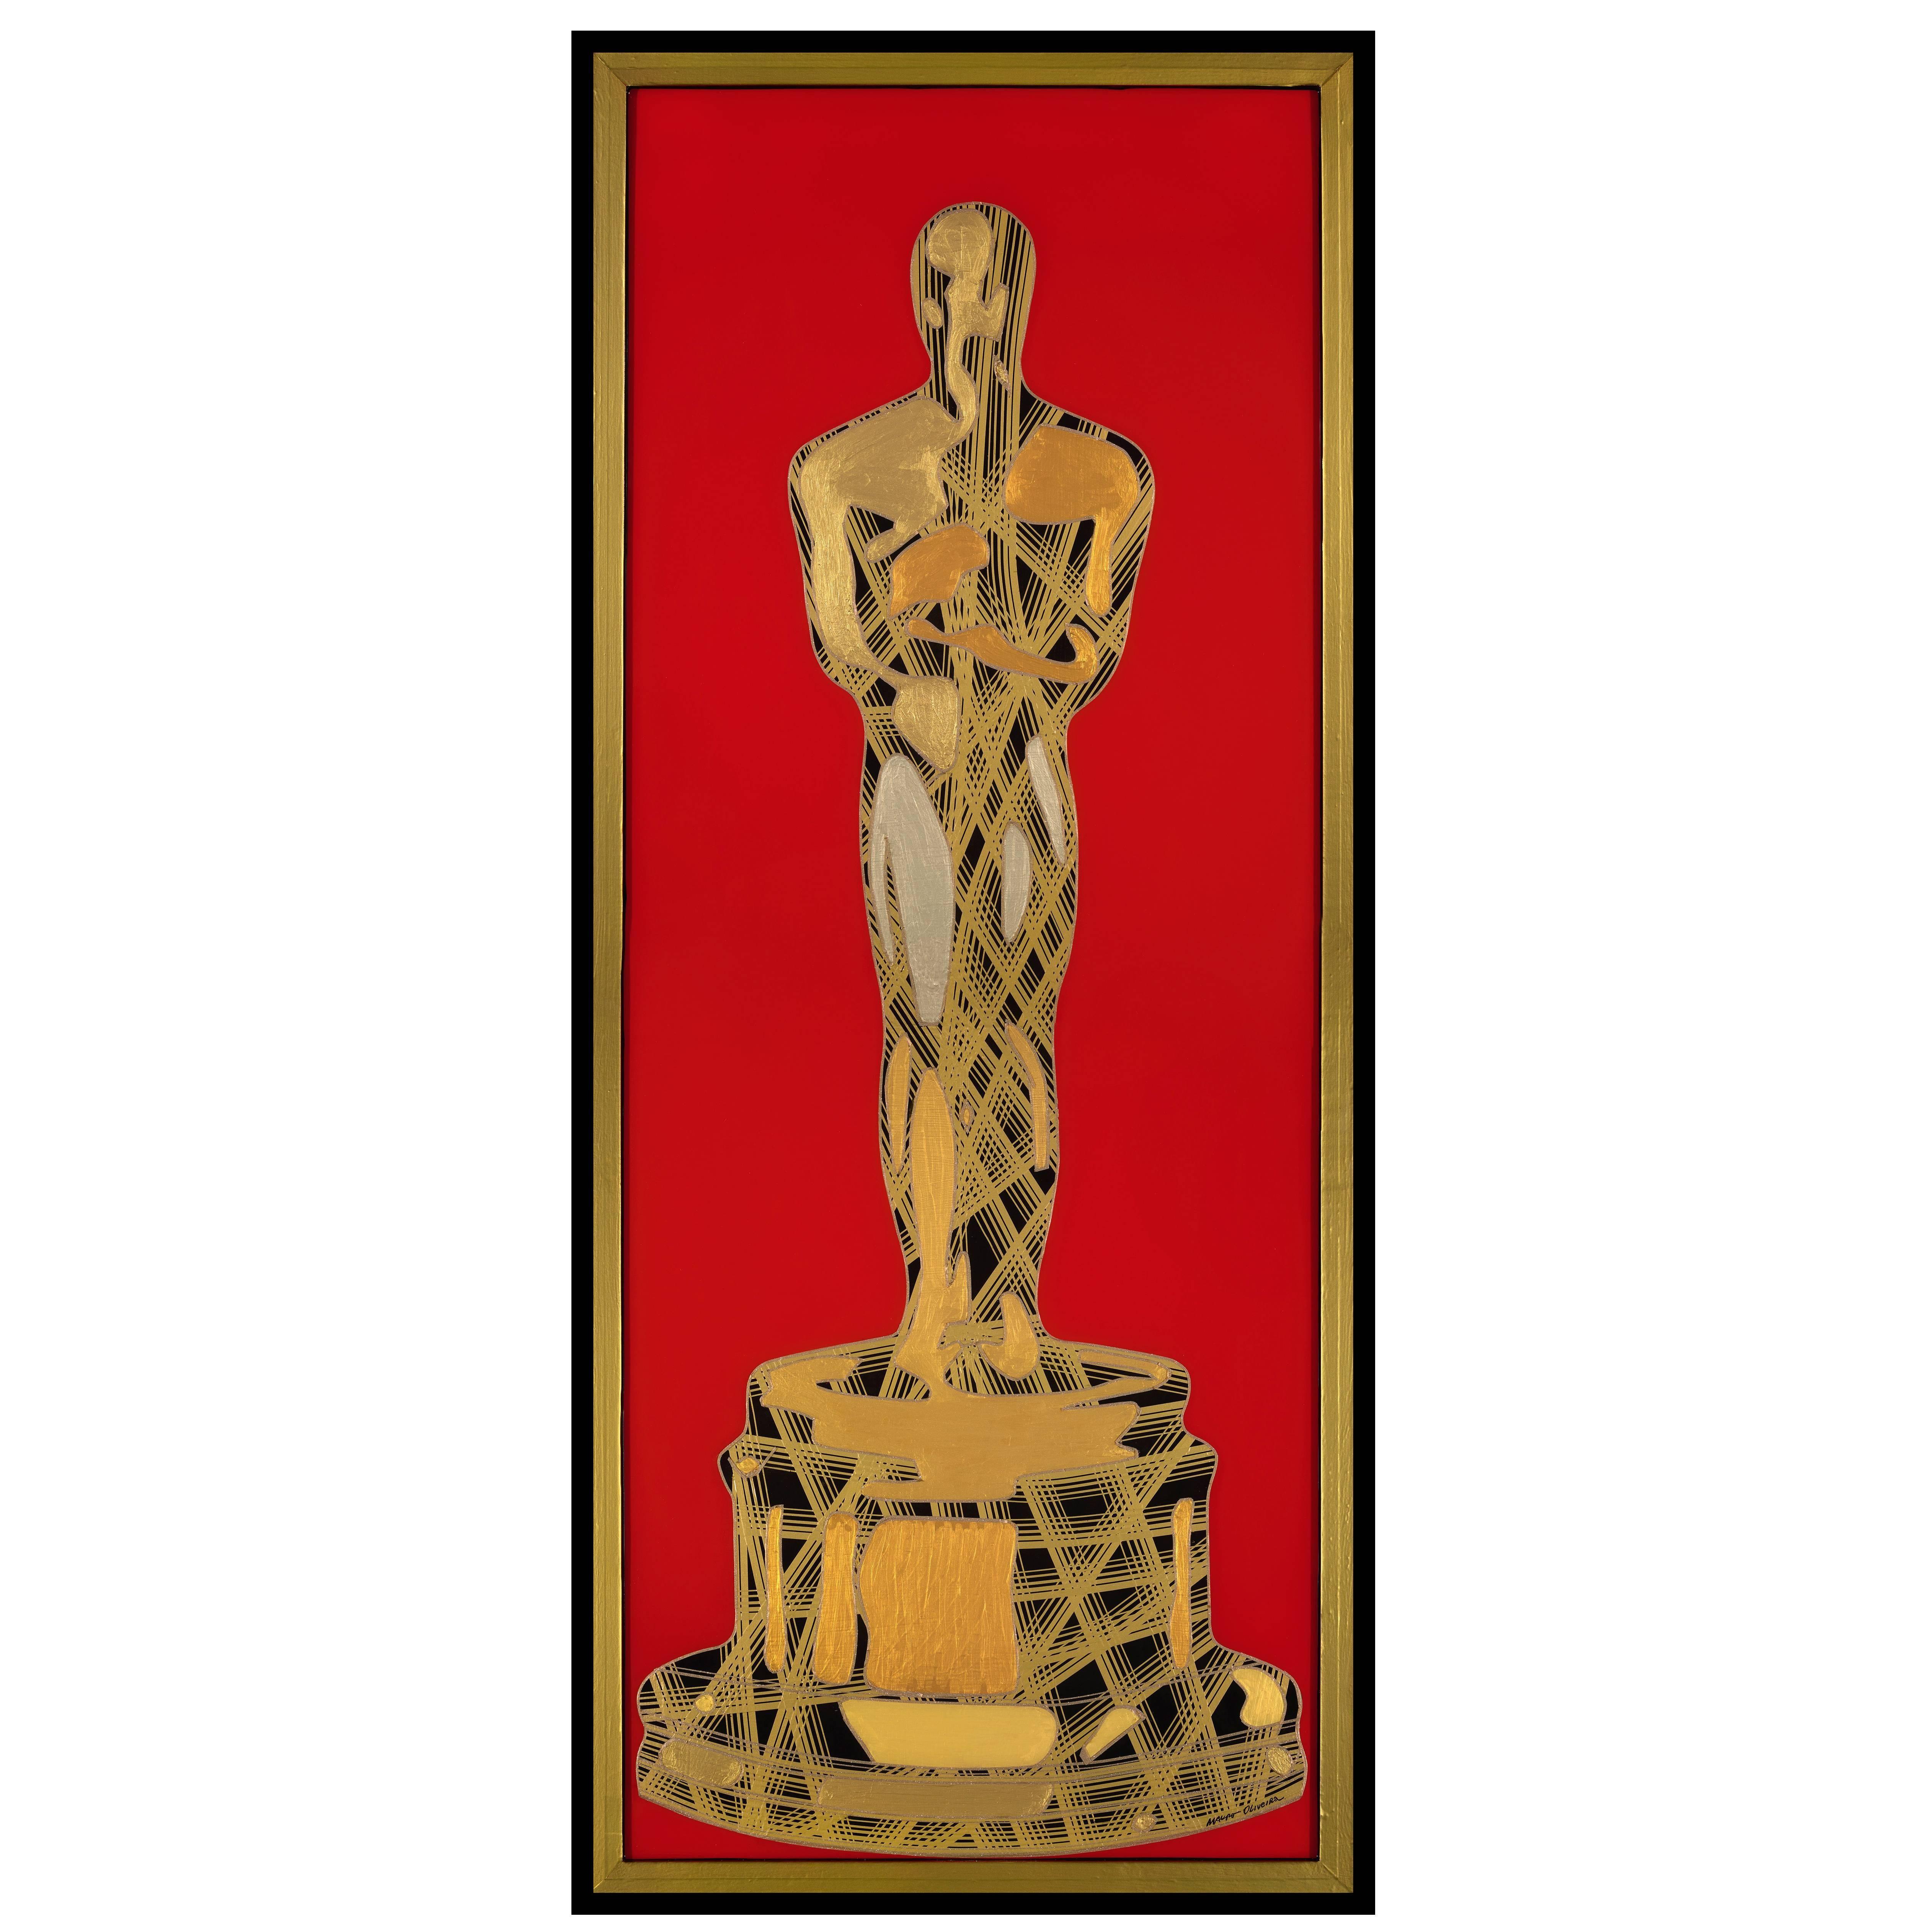 Golden Oscar by Mauro Oliveira